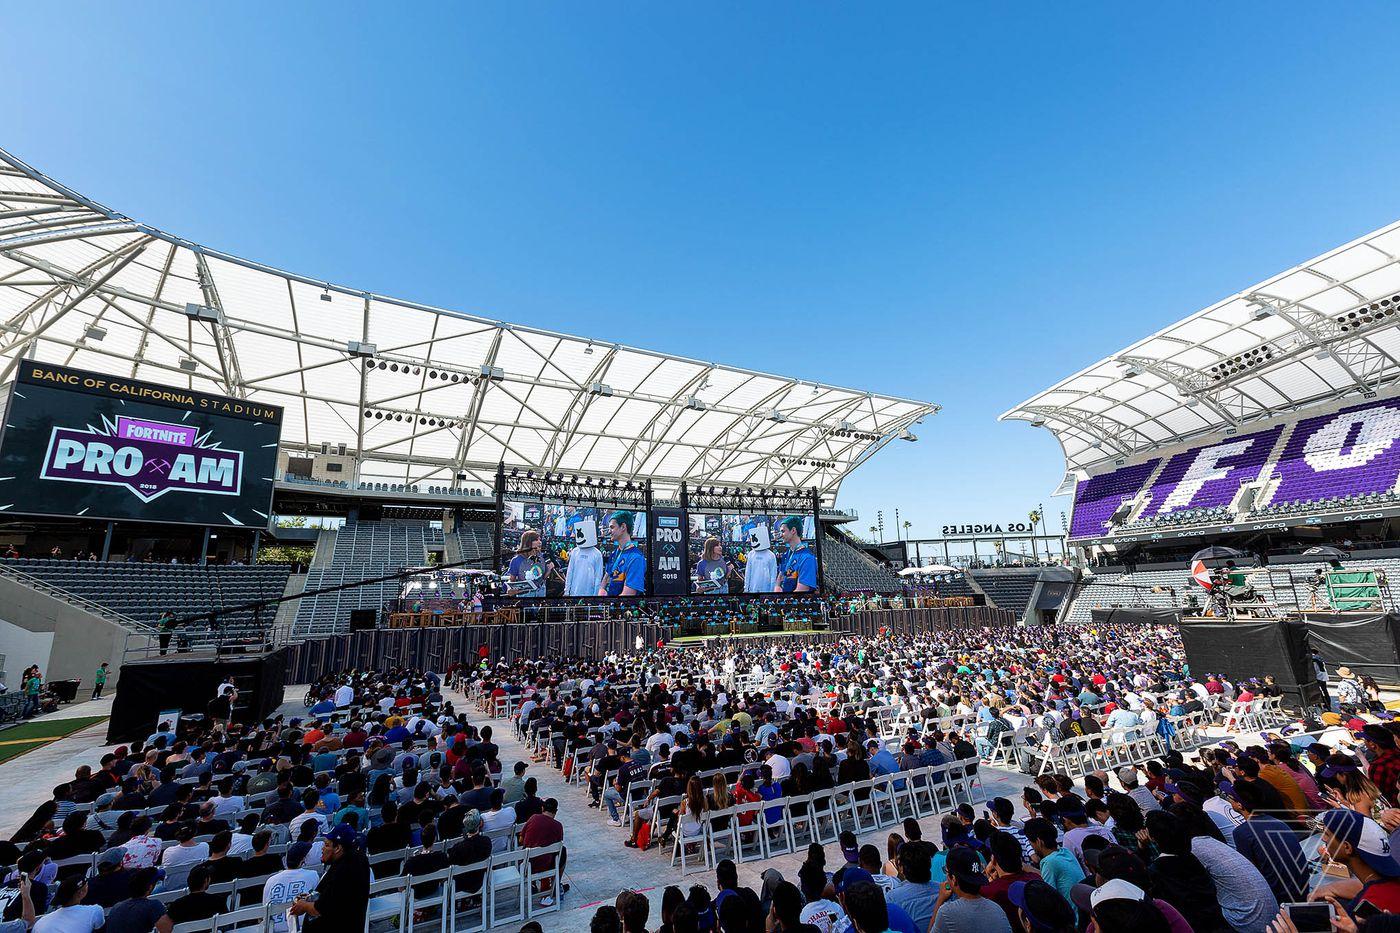 Fortnite's celebrity tournament felt like a trial run for